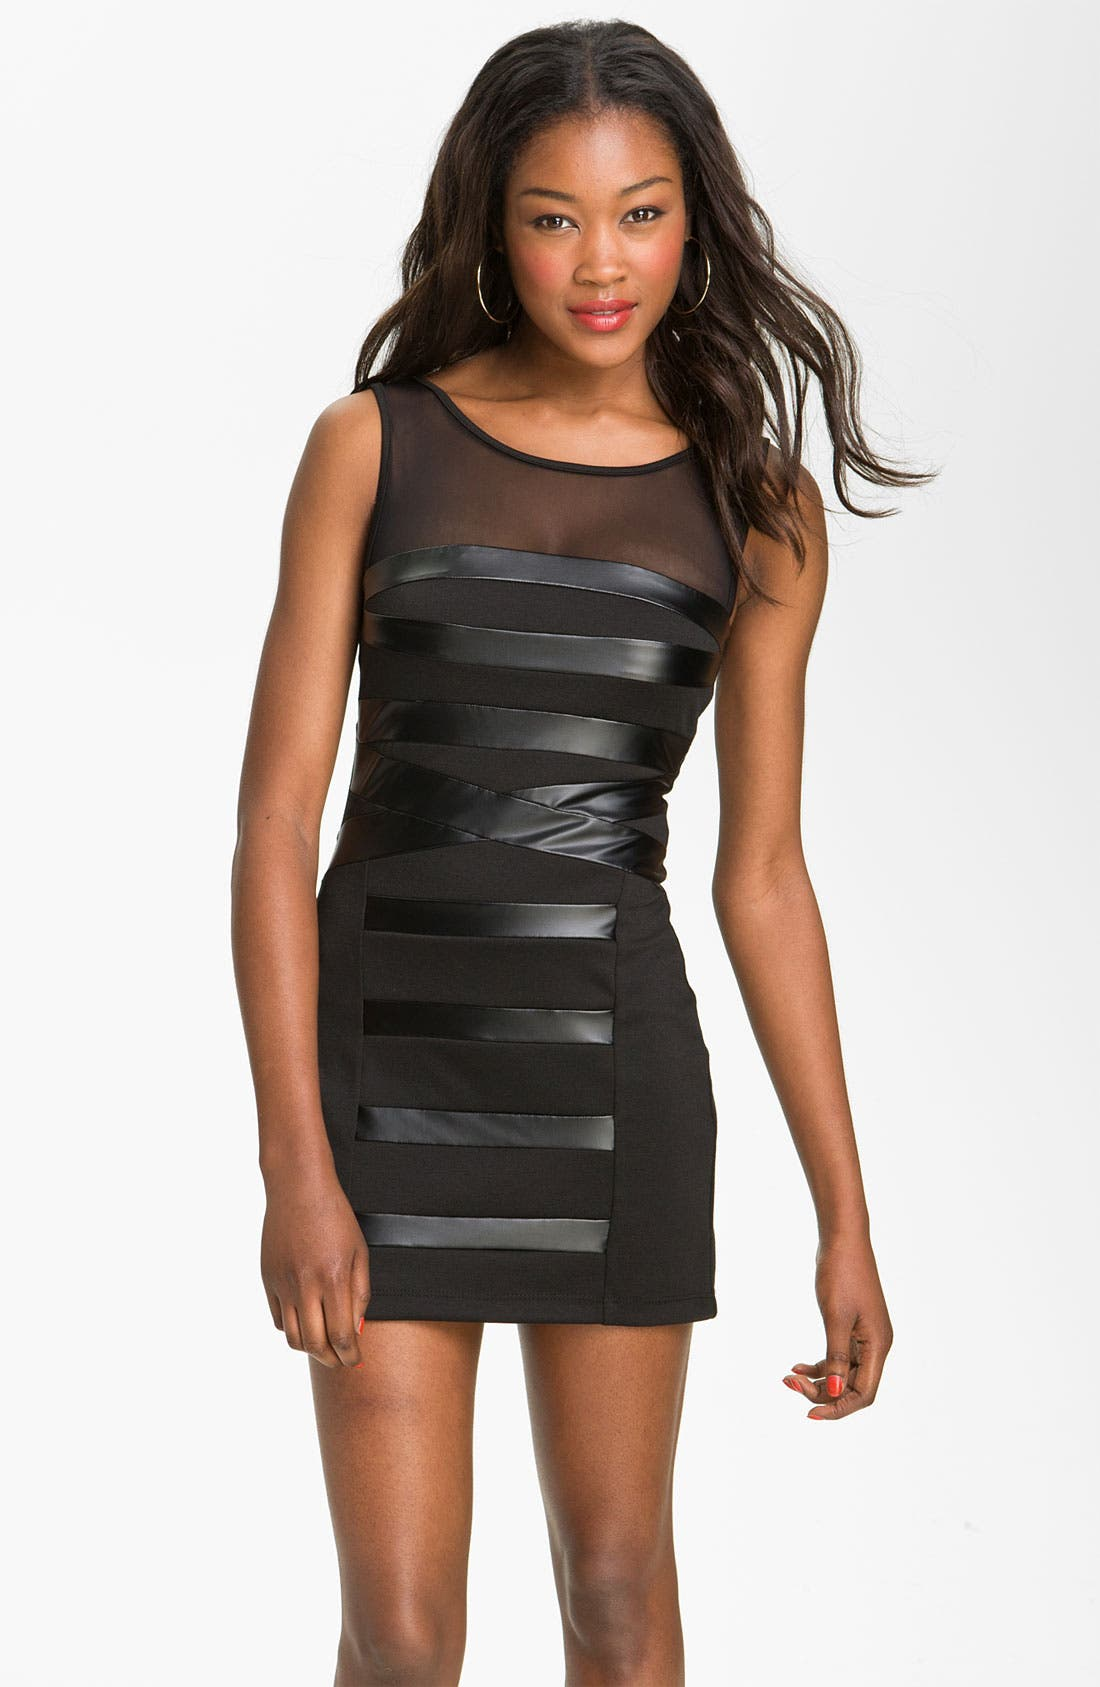 Alternate Image 1 Selected - Trixxi Faux Leather Bandage Dress (Juniors)